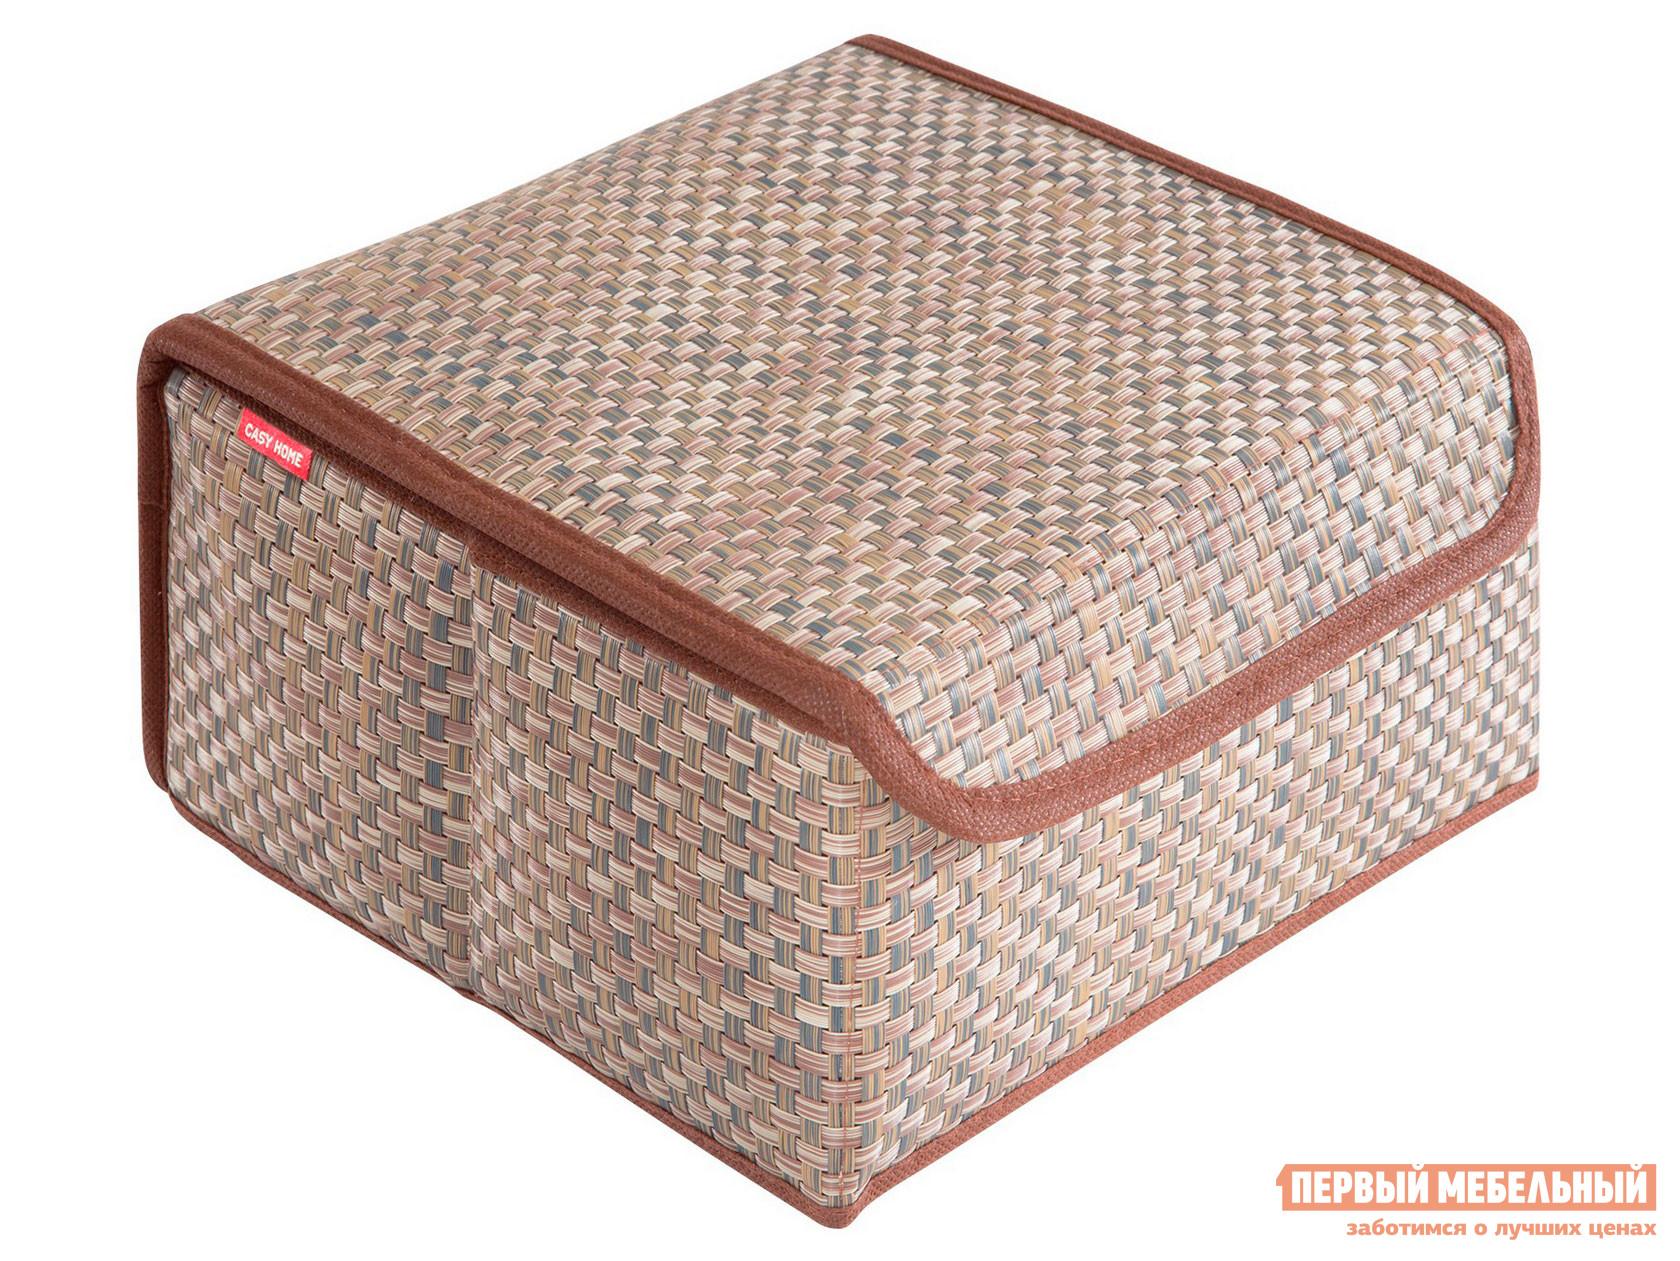 Кофр  Коробка для хранения с крышкой 27х25х12см Бежевый